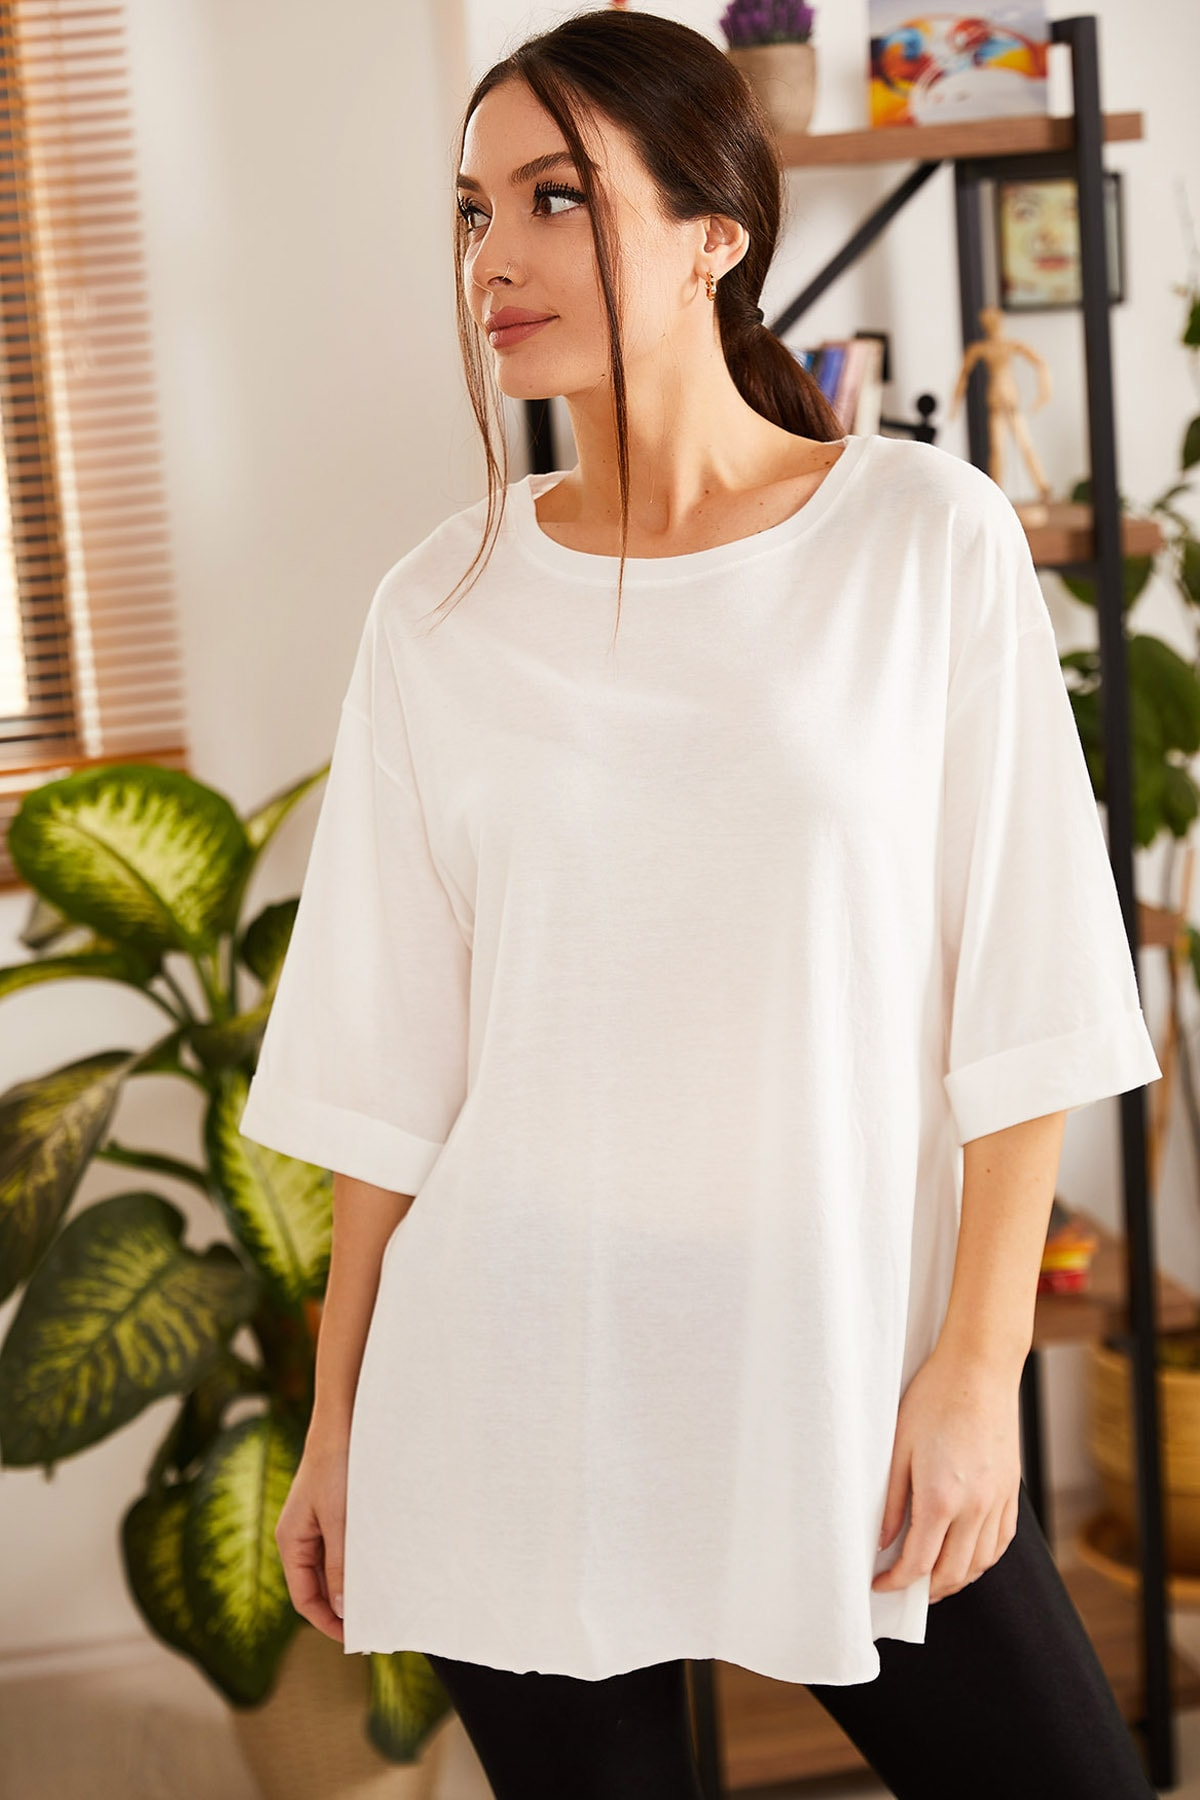 armonika Kadın Ekru Yuvarlak Yaka Geniş Kollu Yanı Yırtmaçlı T-Shirt ARM-19Y012003 2